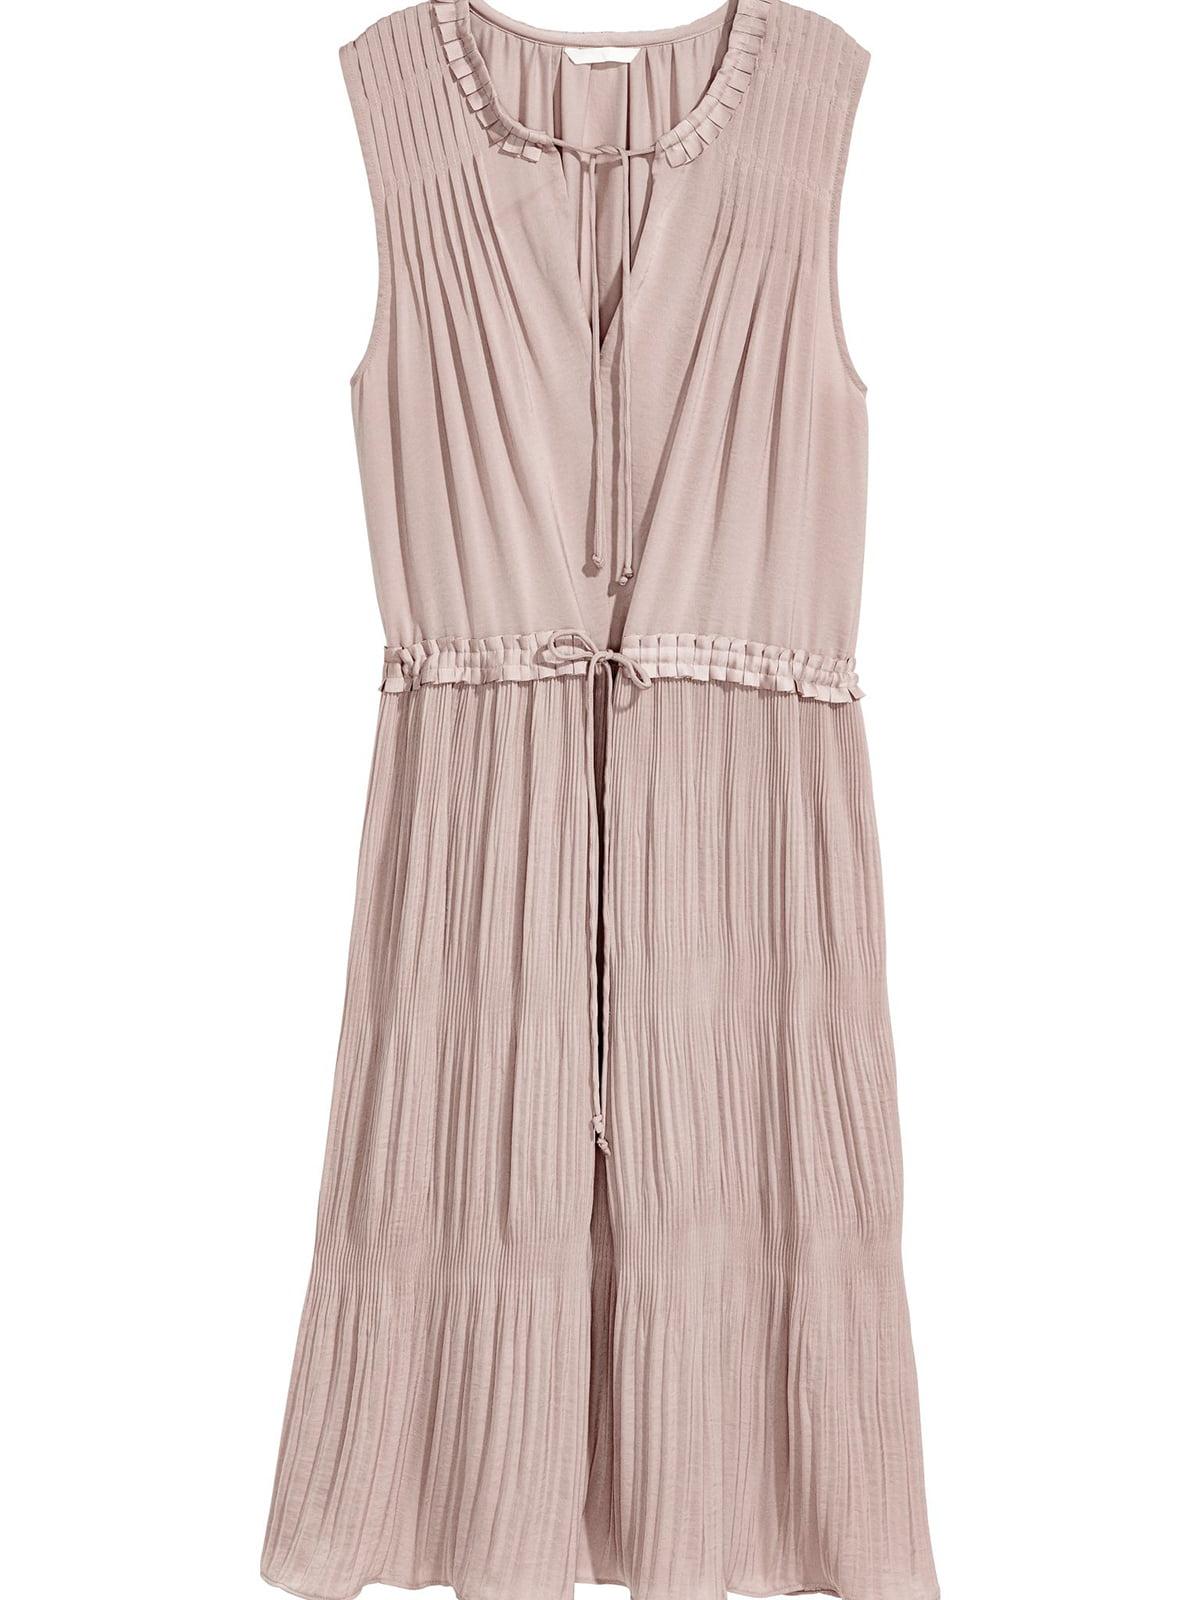 Платье серо-бежевое | 5677095